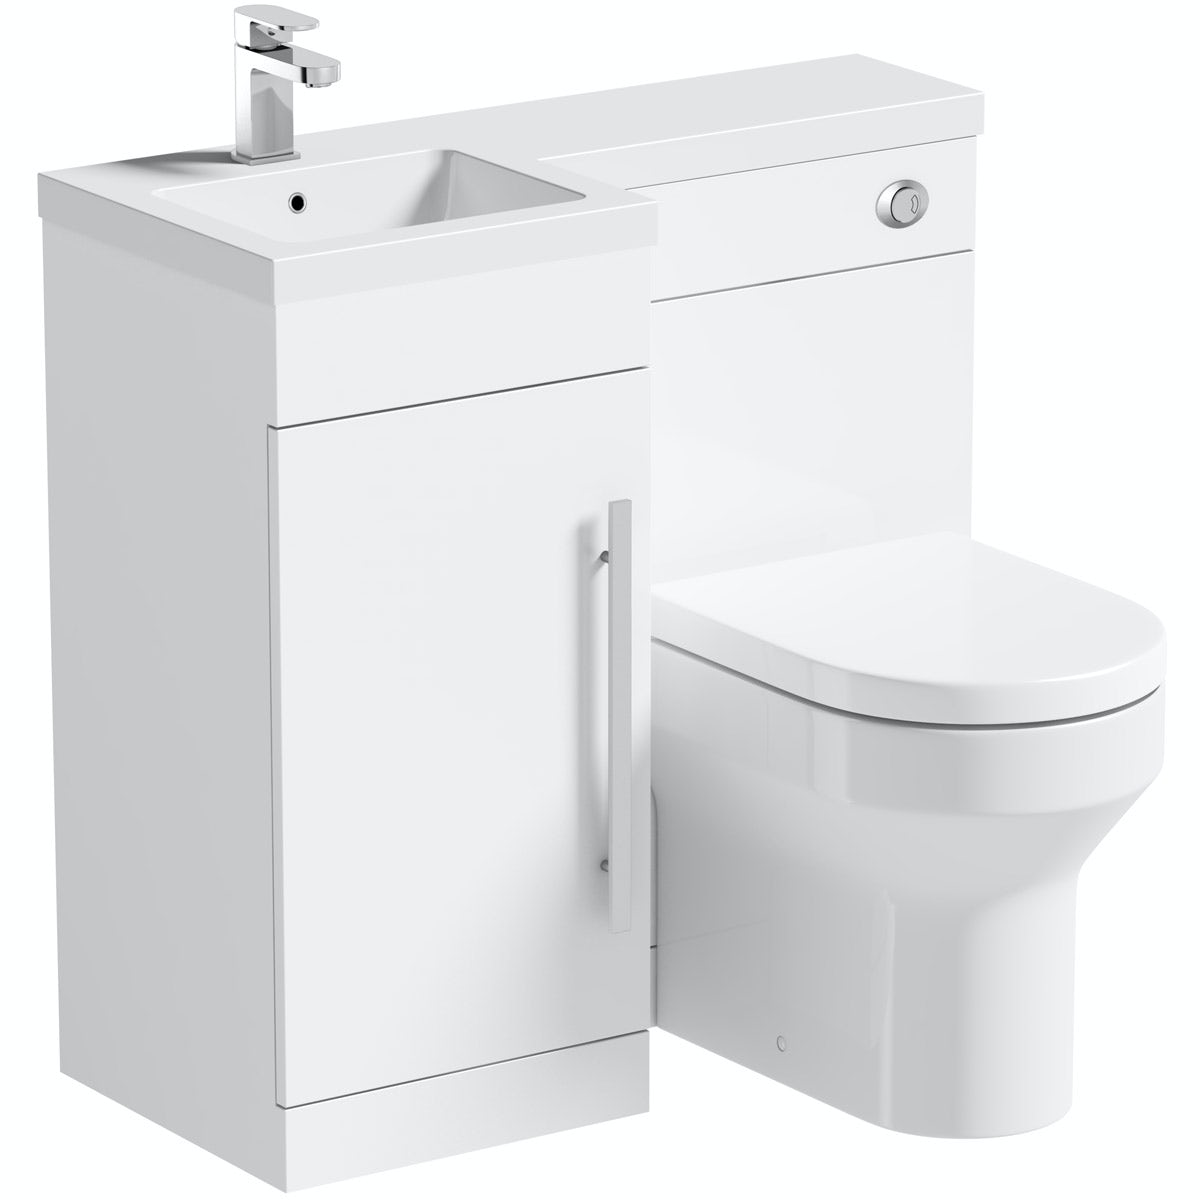 Sink On Toilet Cintinel